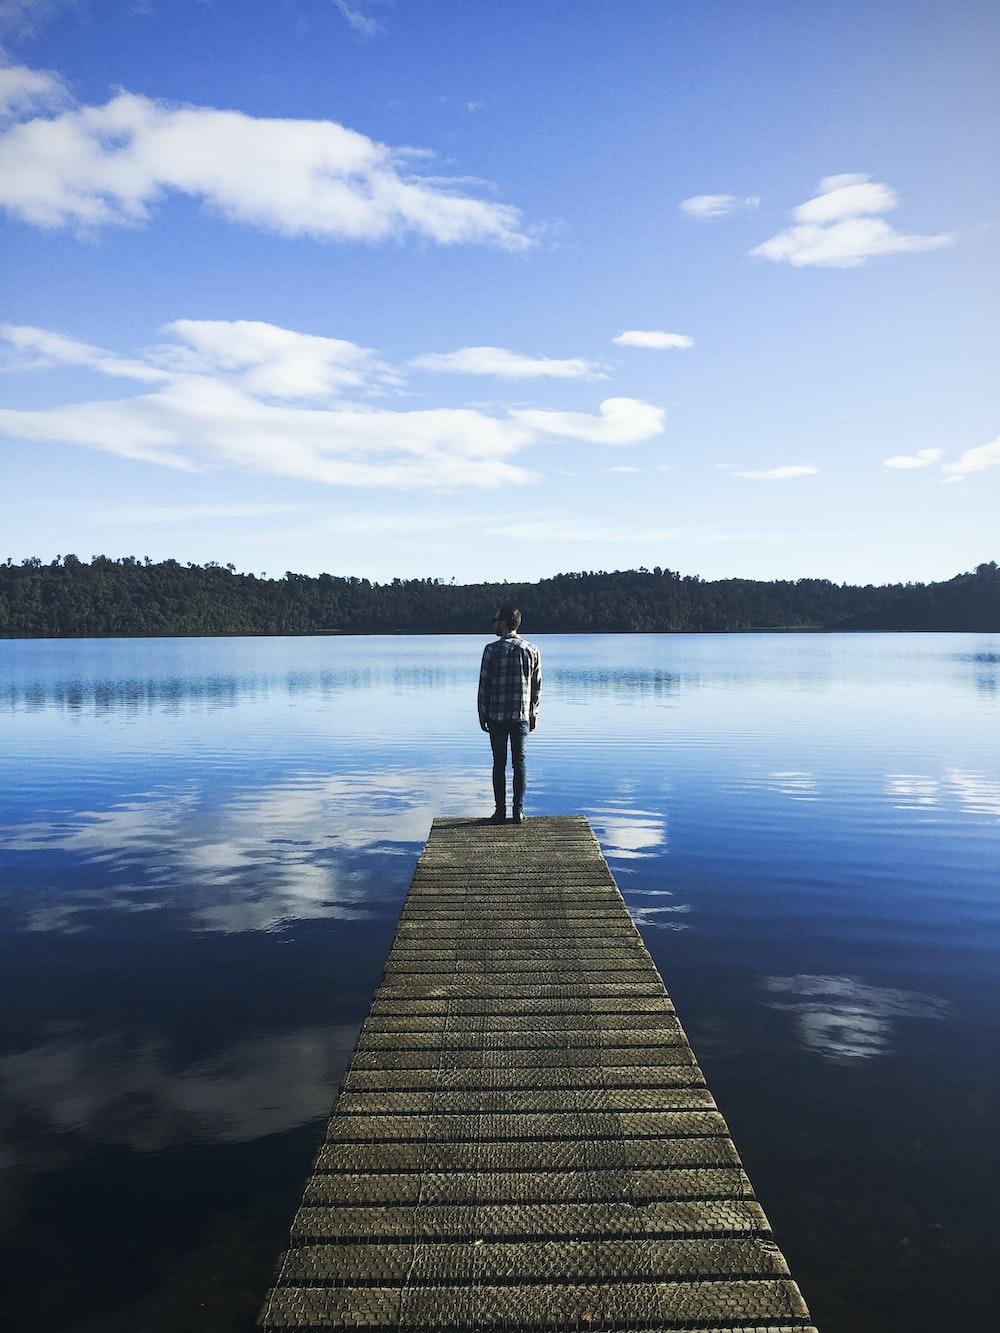 man standing on lake dock watching water under blue sky during daytime